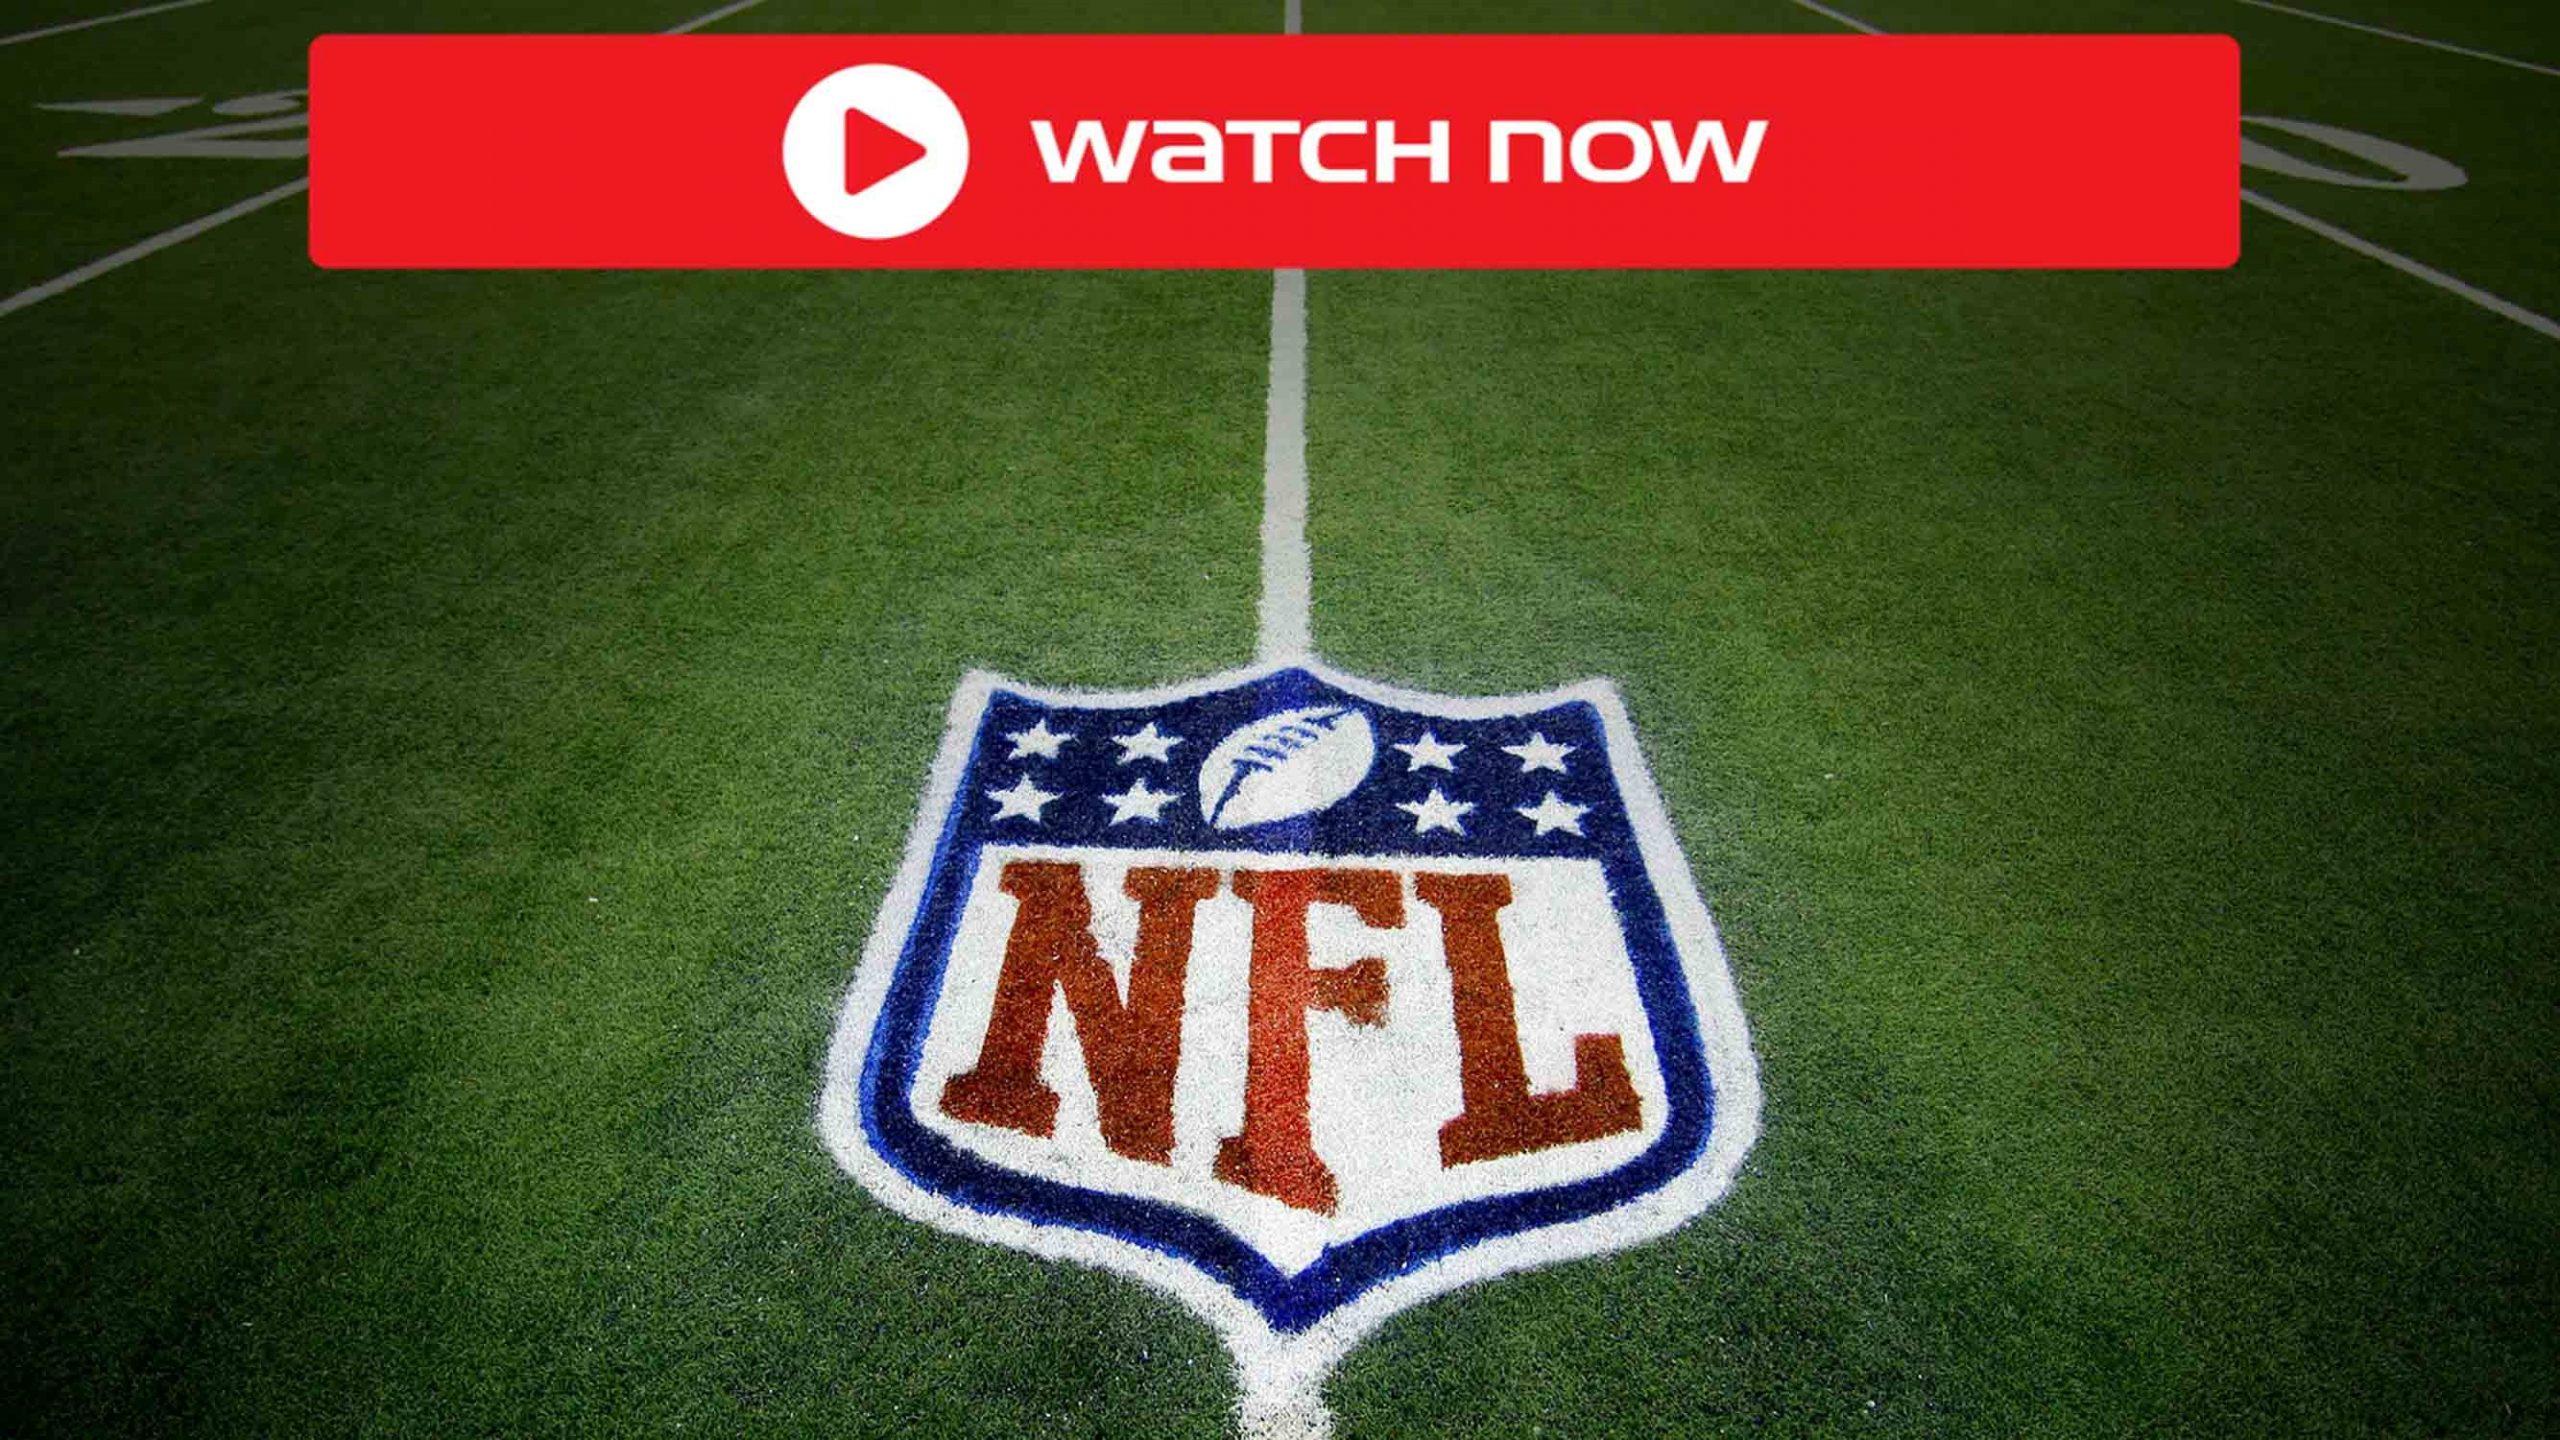 Live Watch Bills Vs Cardinals Live Stream Nfl Week 10 Game Online Now Programming Insider